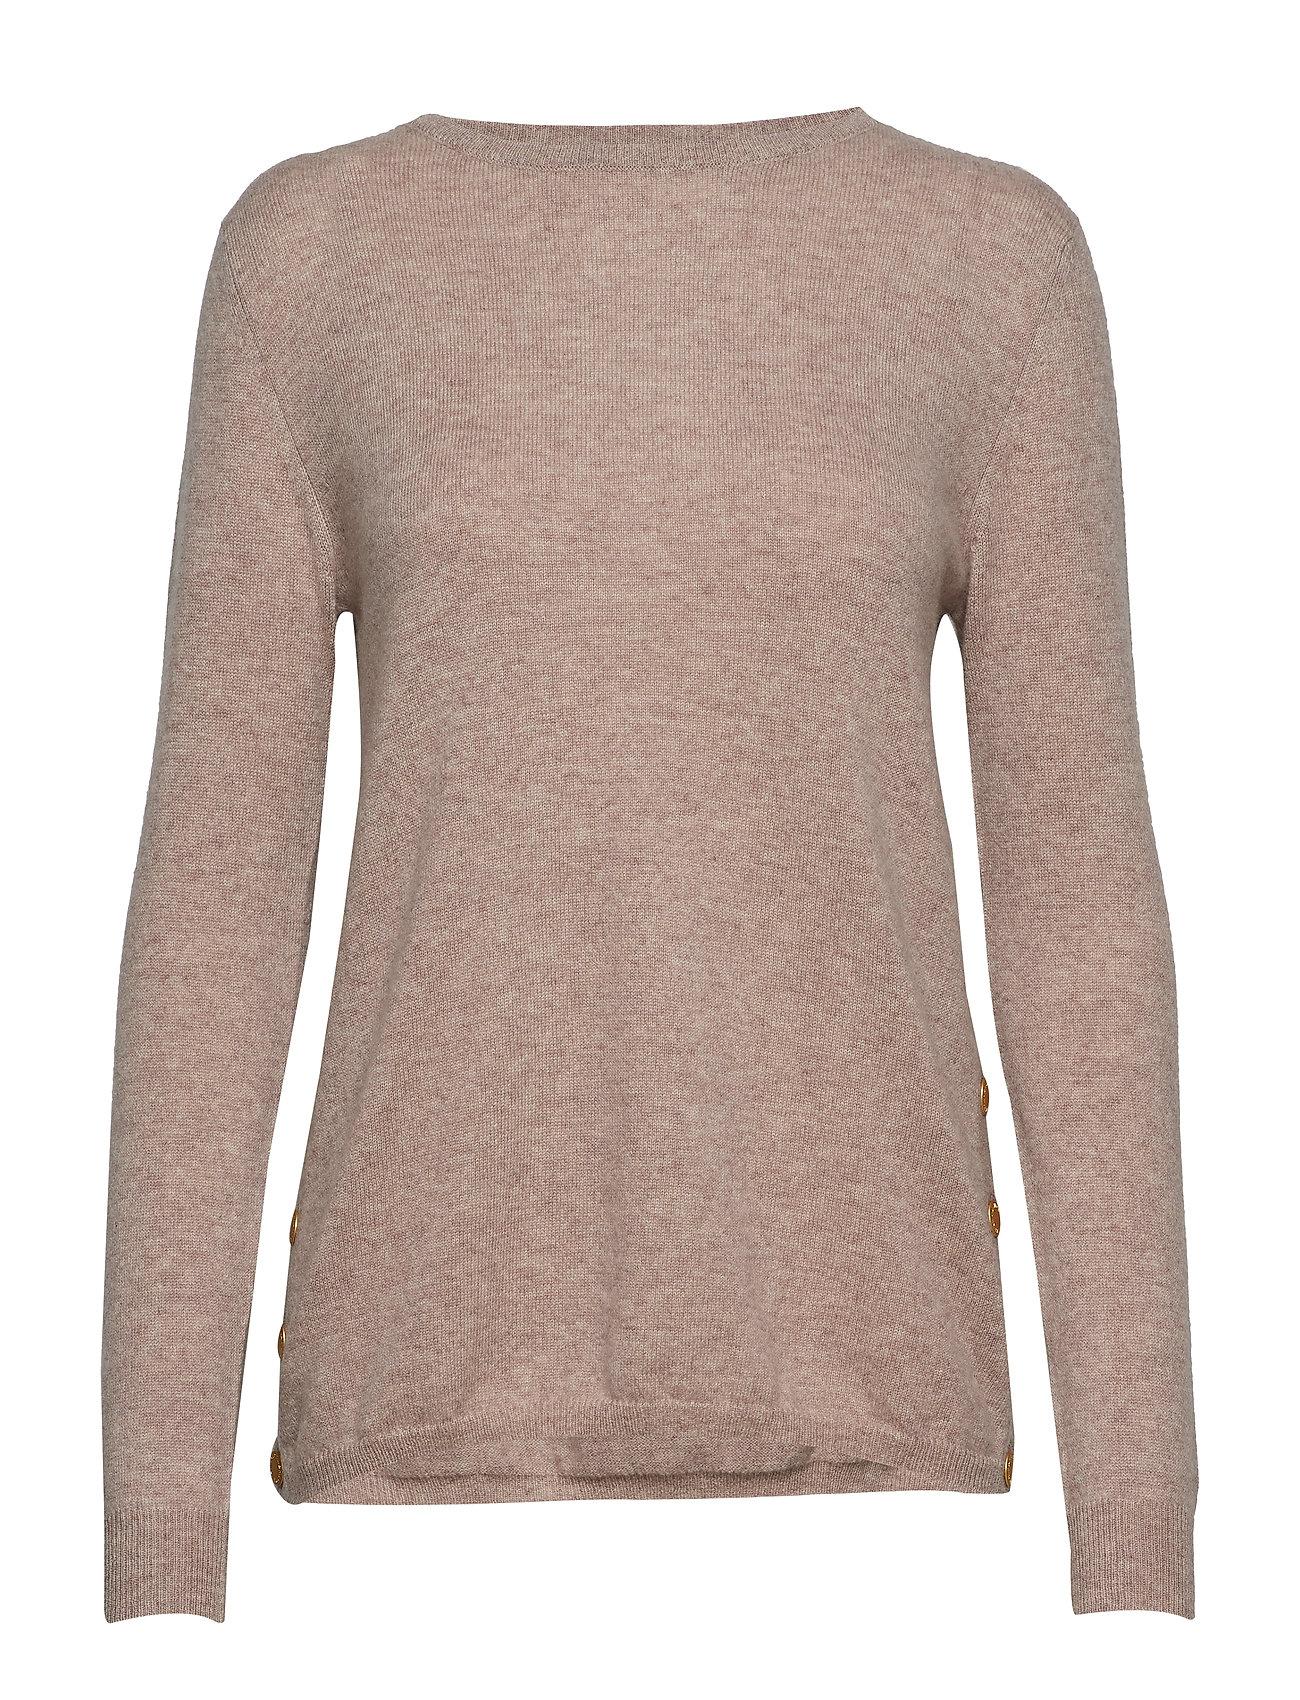 Davida Cashmere Side Buttons Sweater - SAND